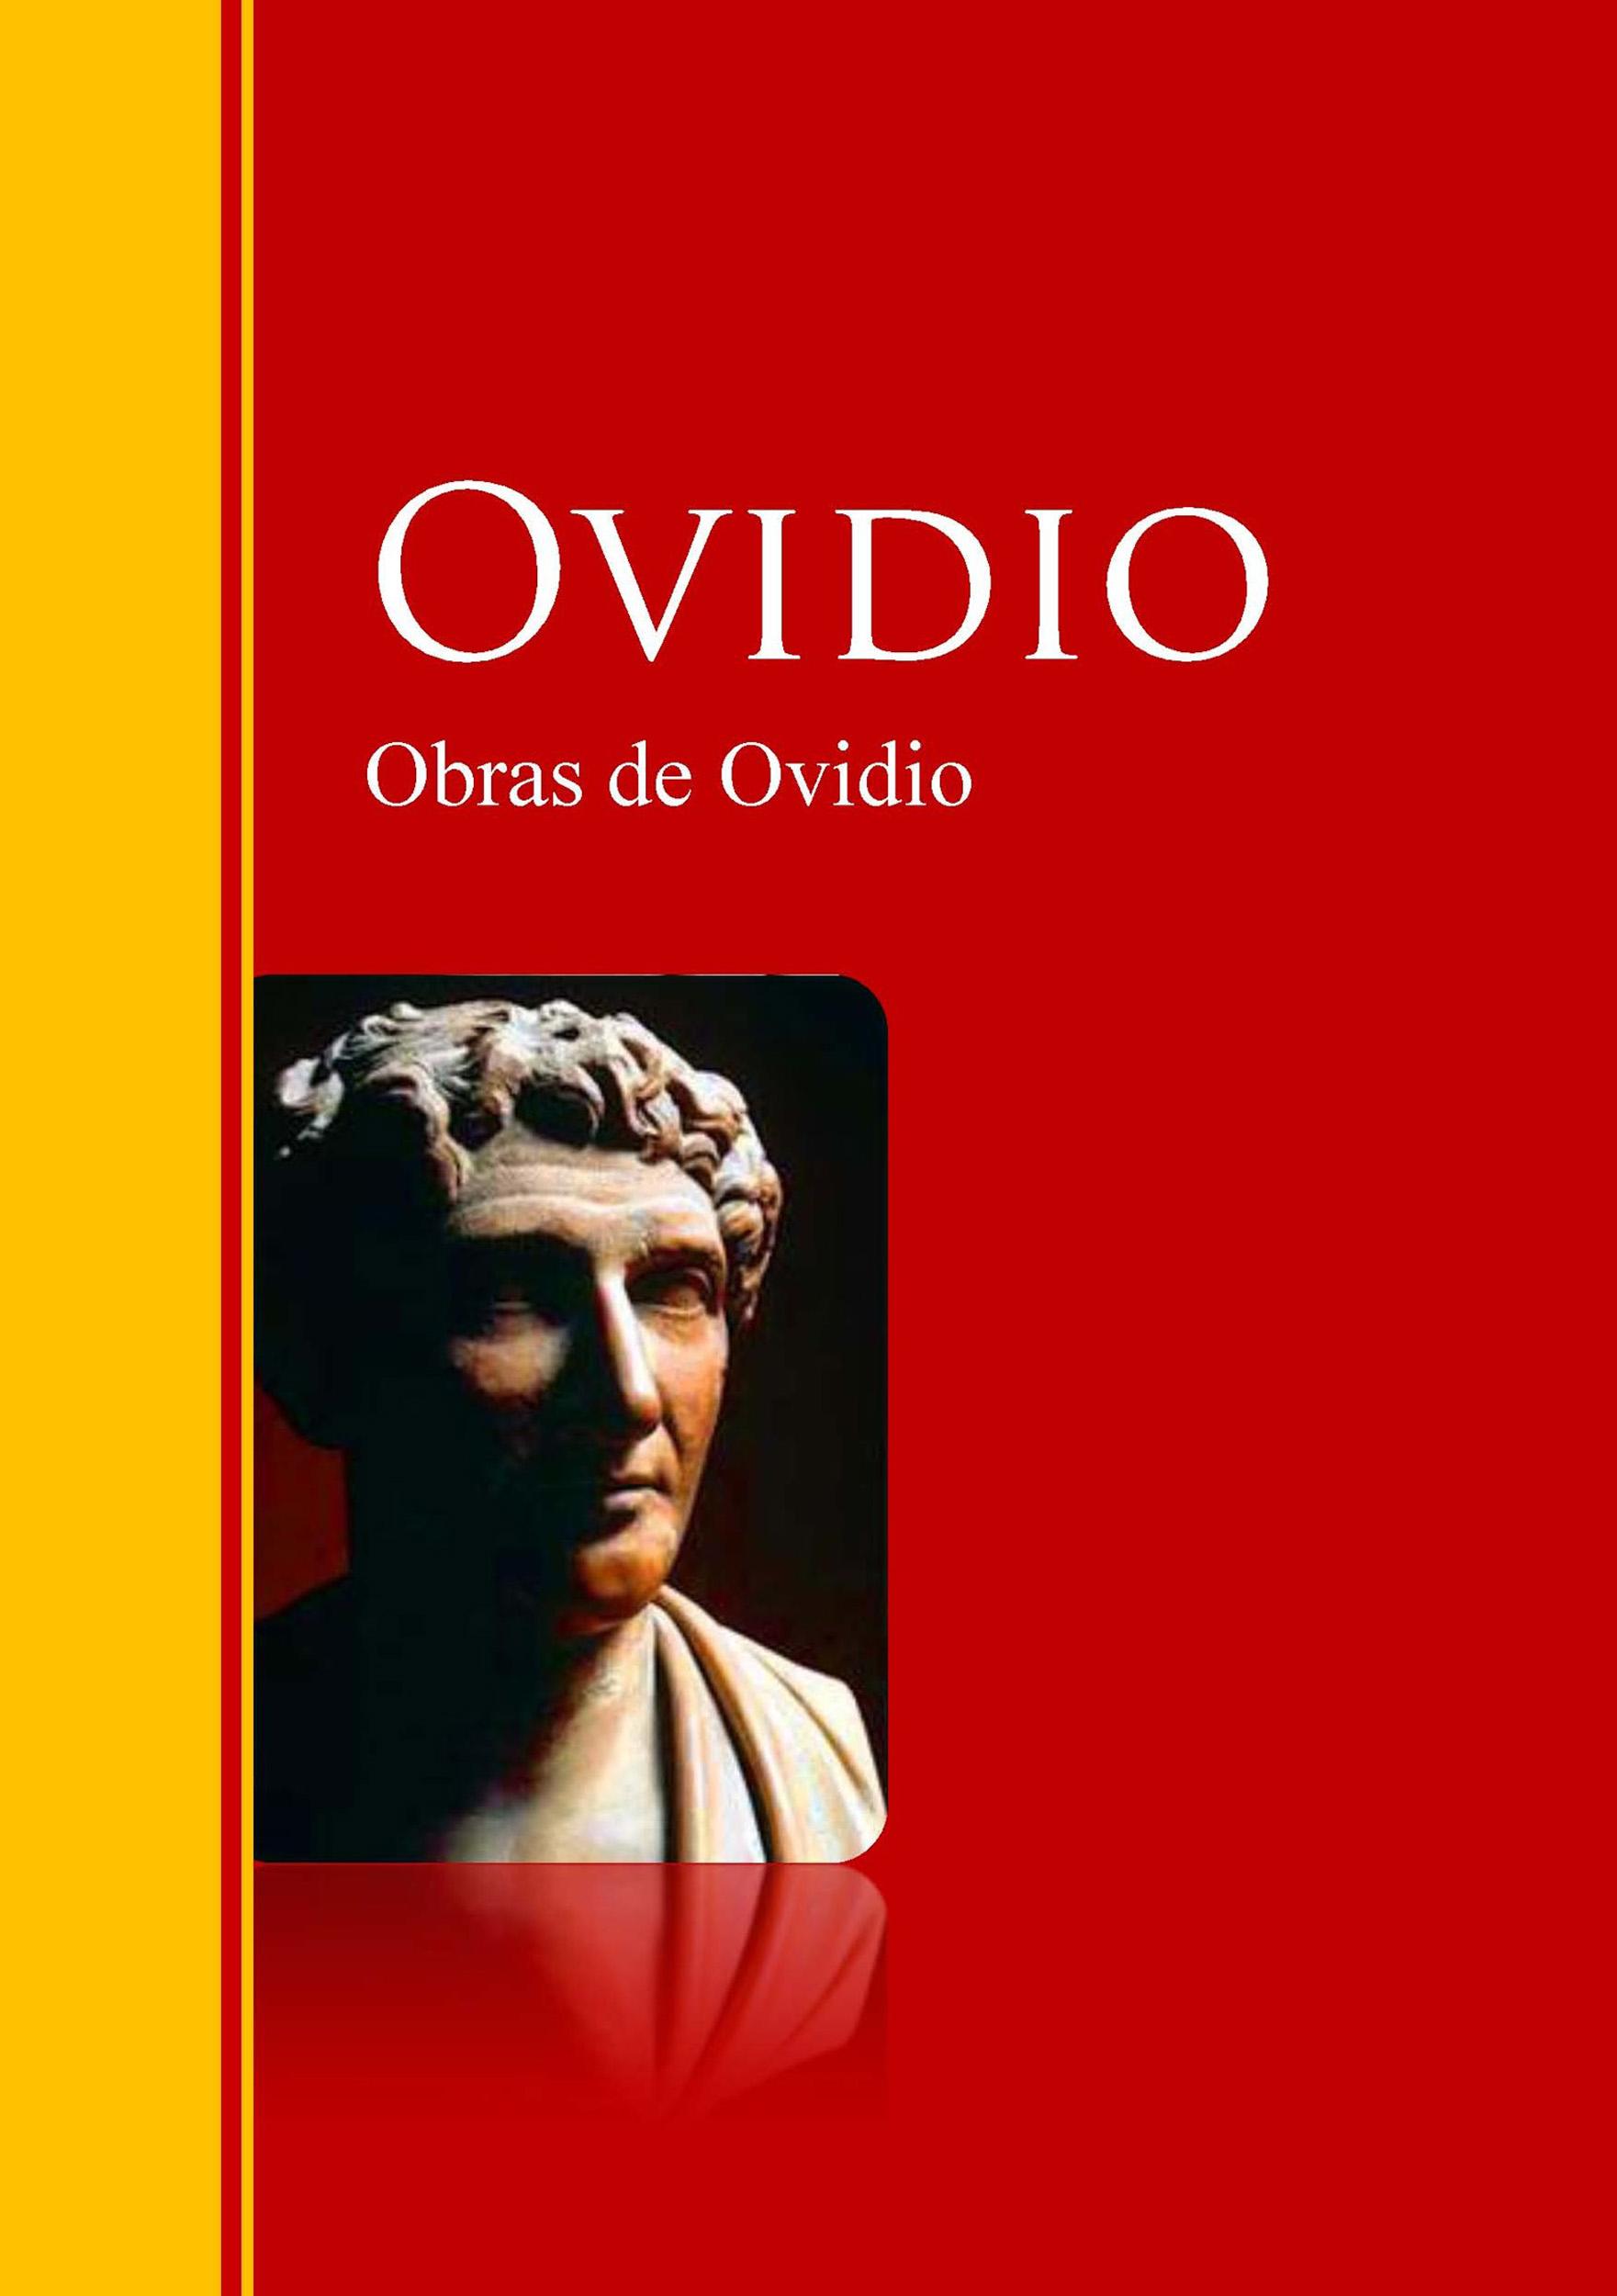 Ovidio Obras de Ovidio недорого